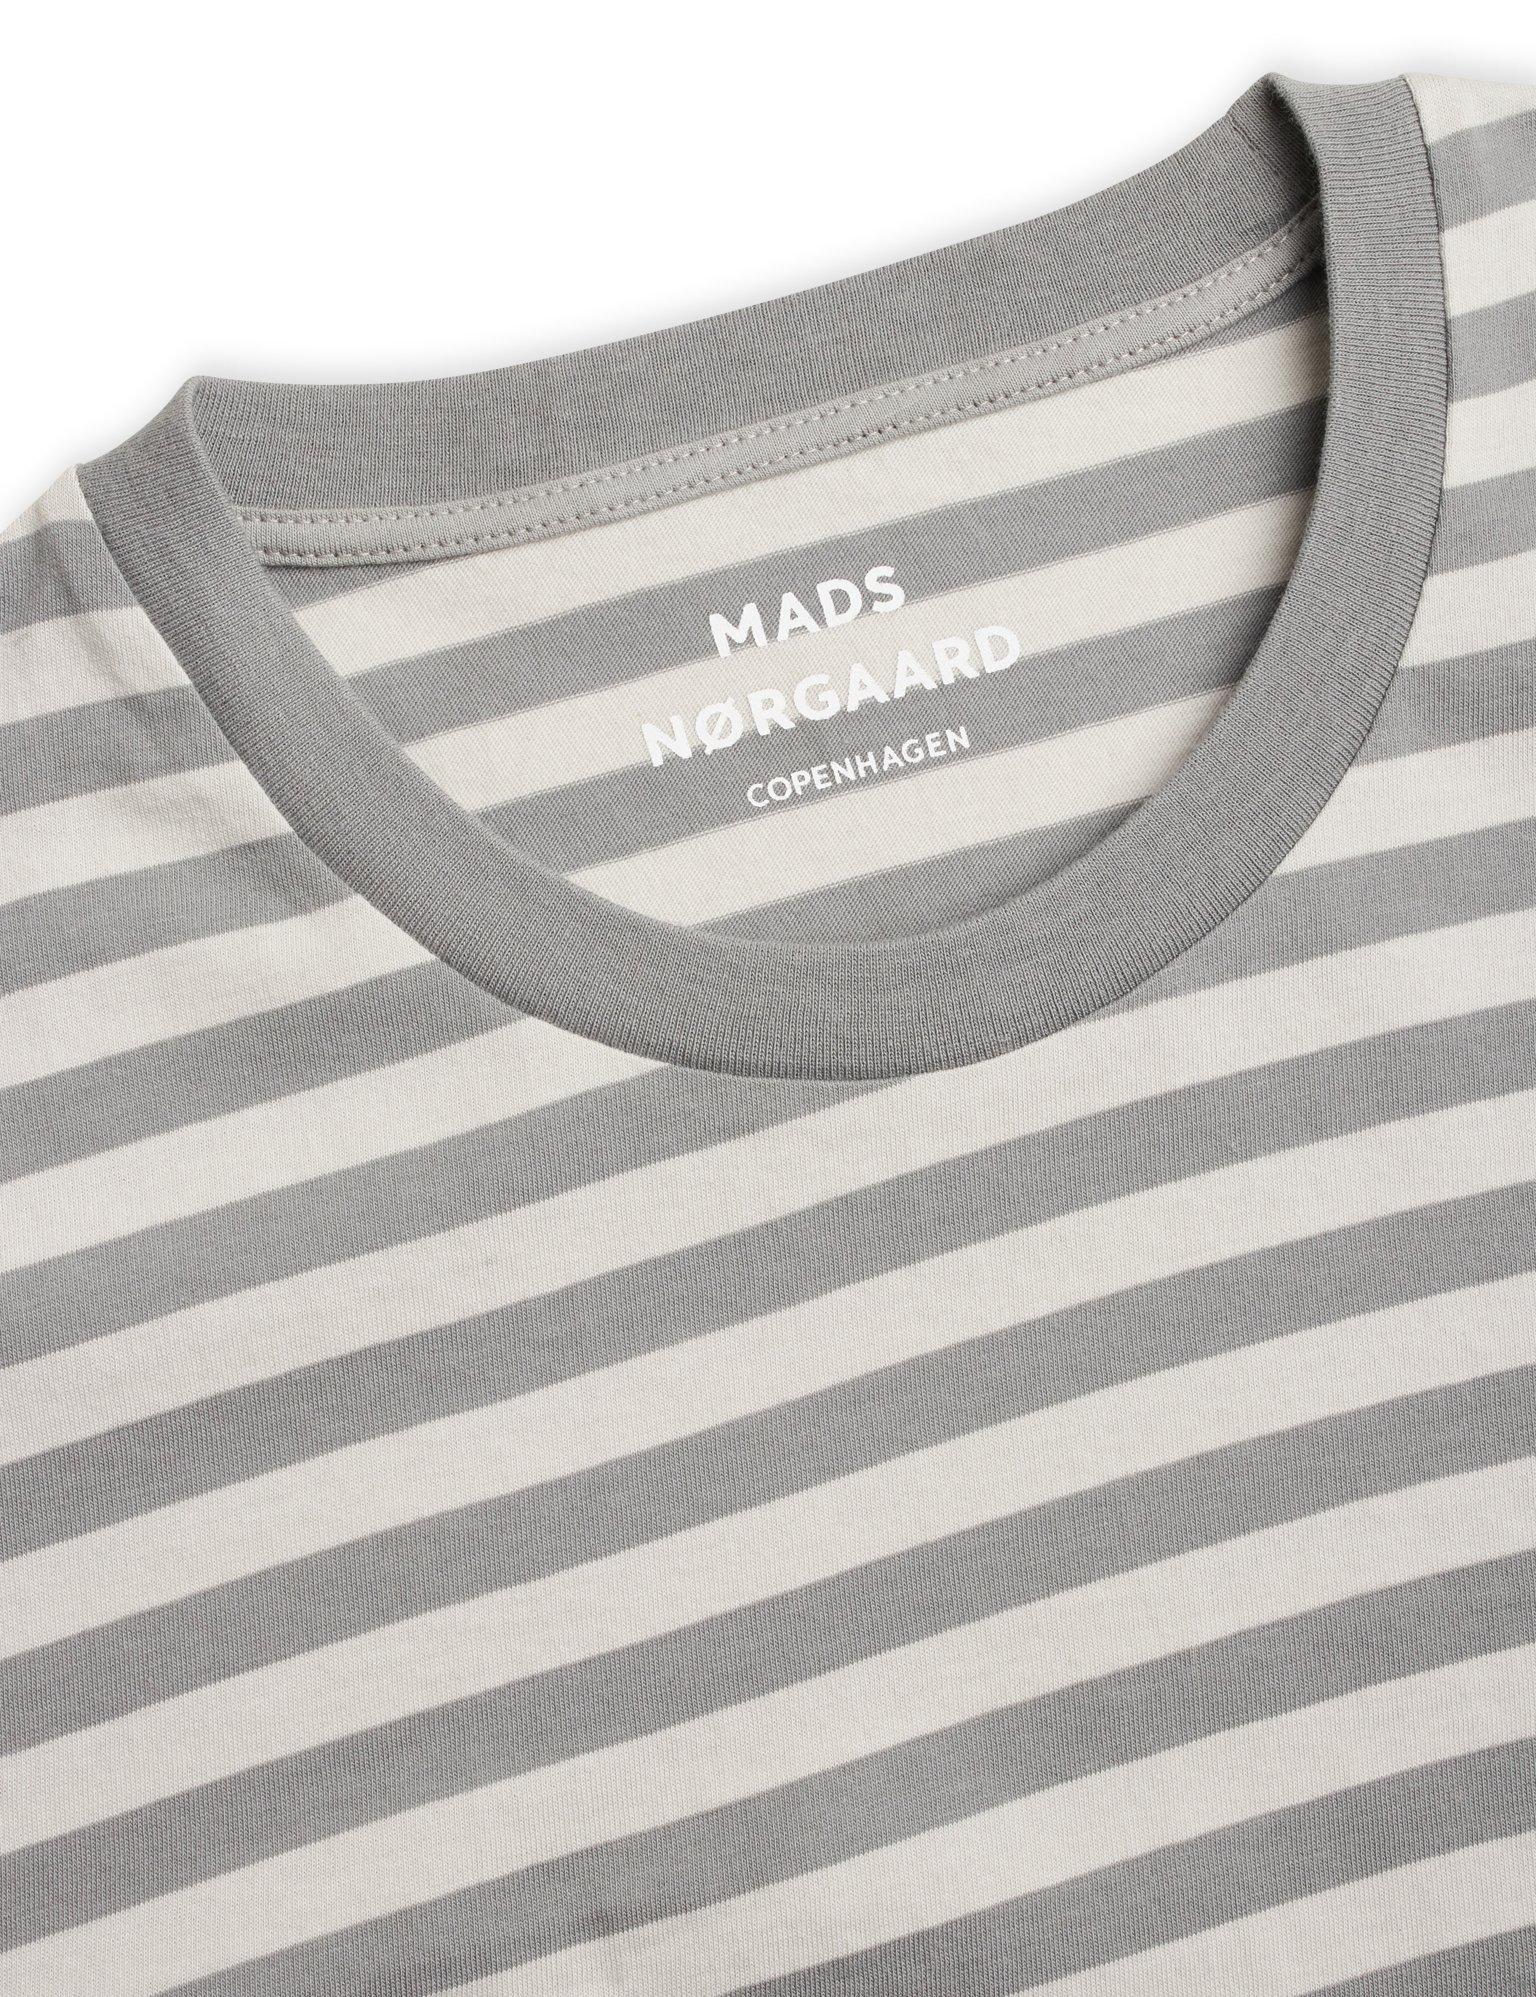 Mads Nørgaard Midi Thor t-shirt, monument/lunar rock, large